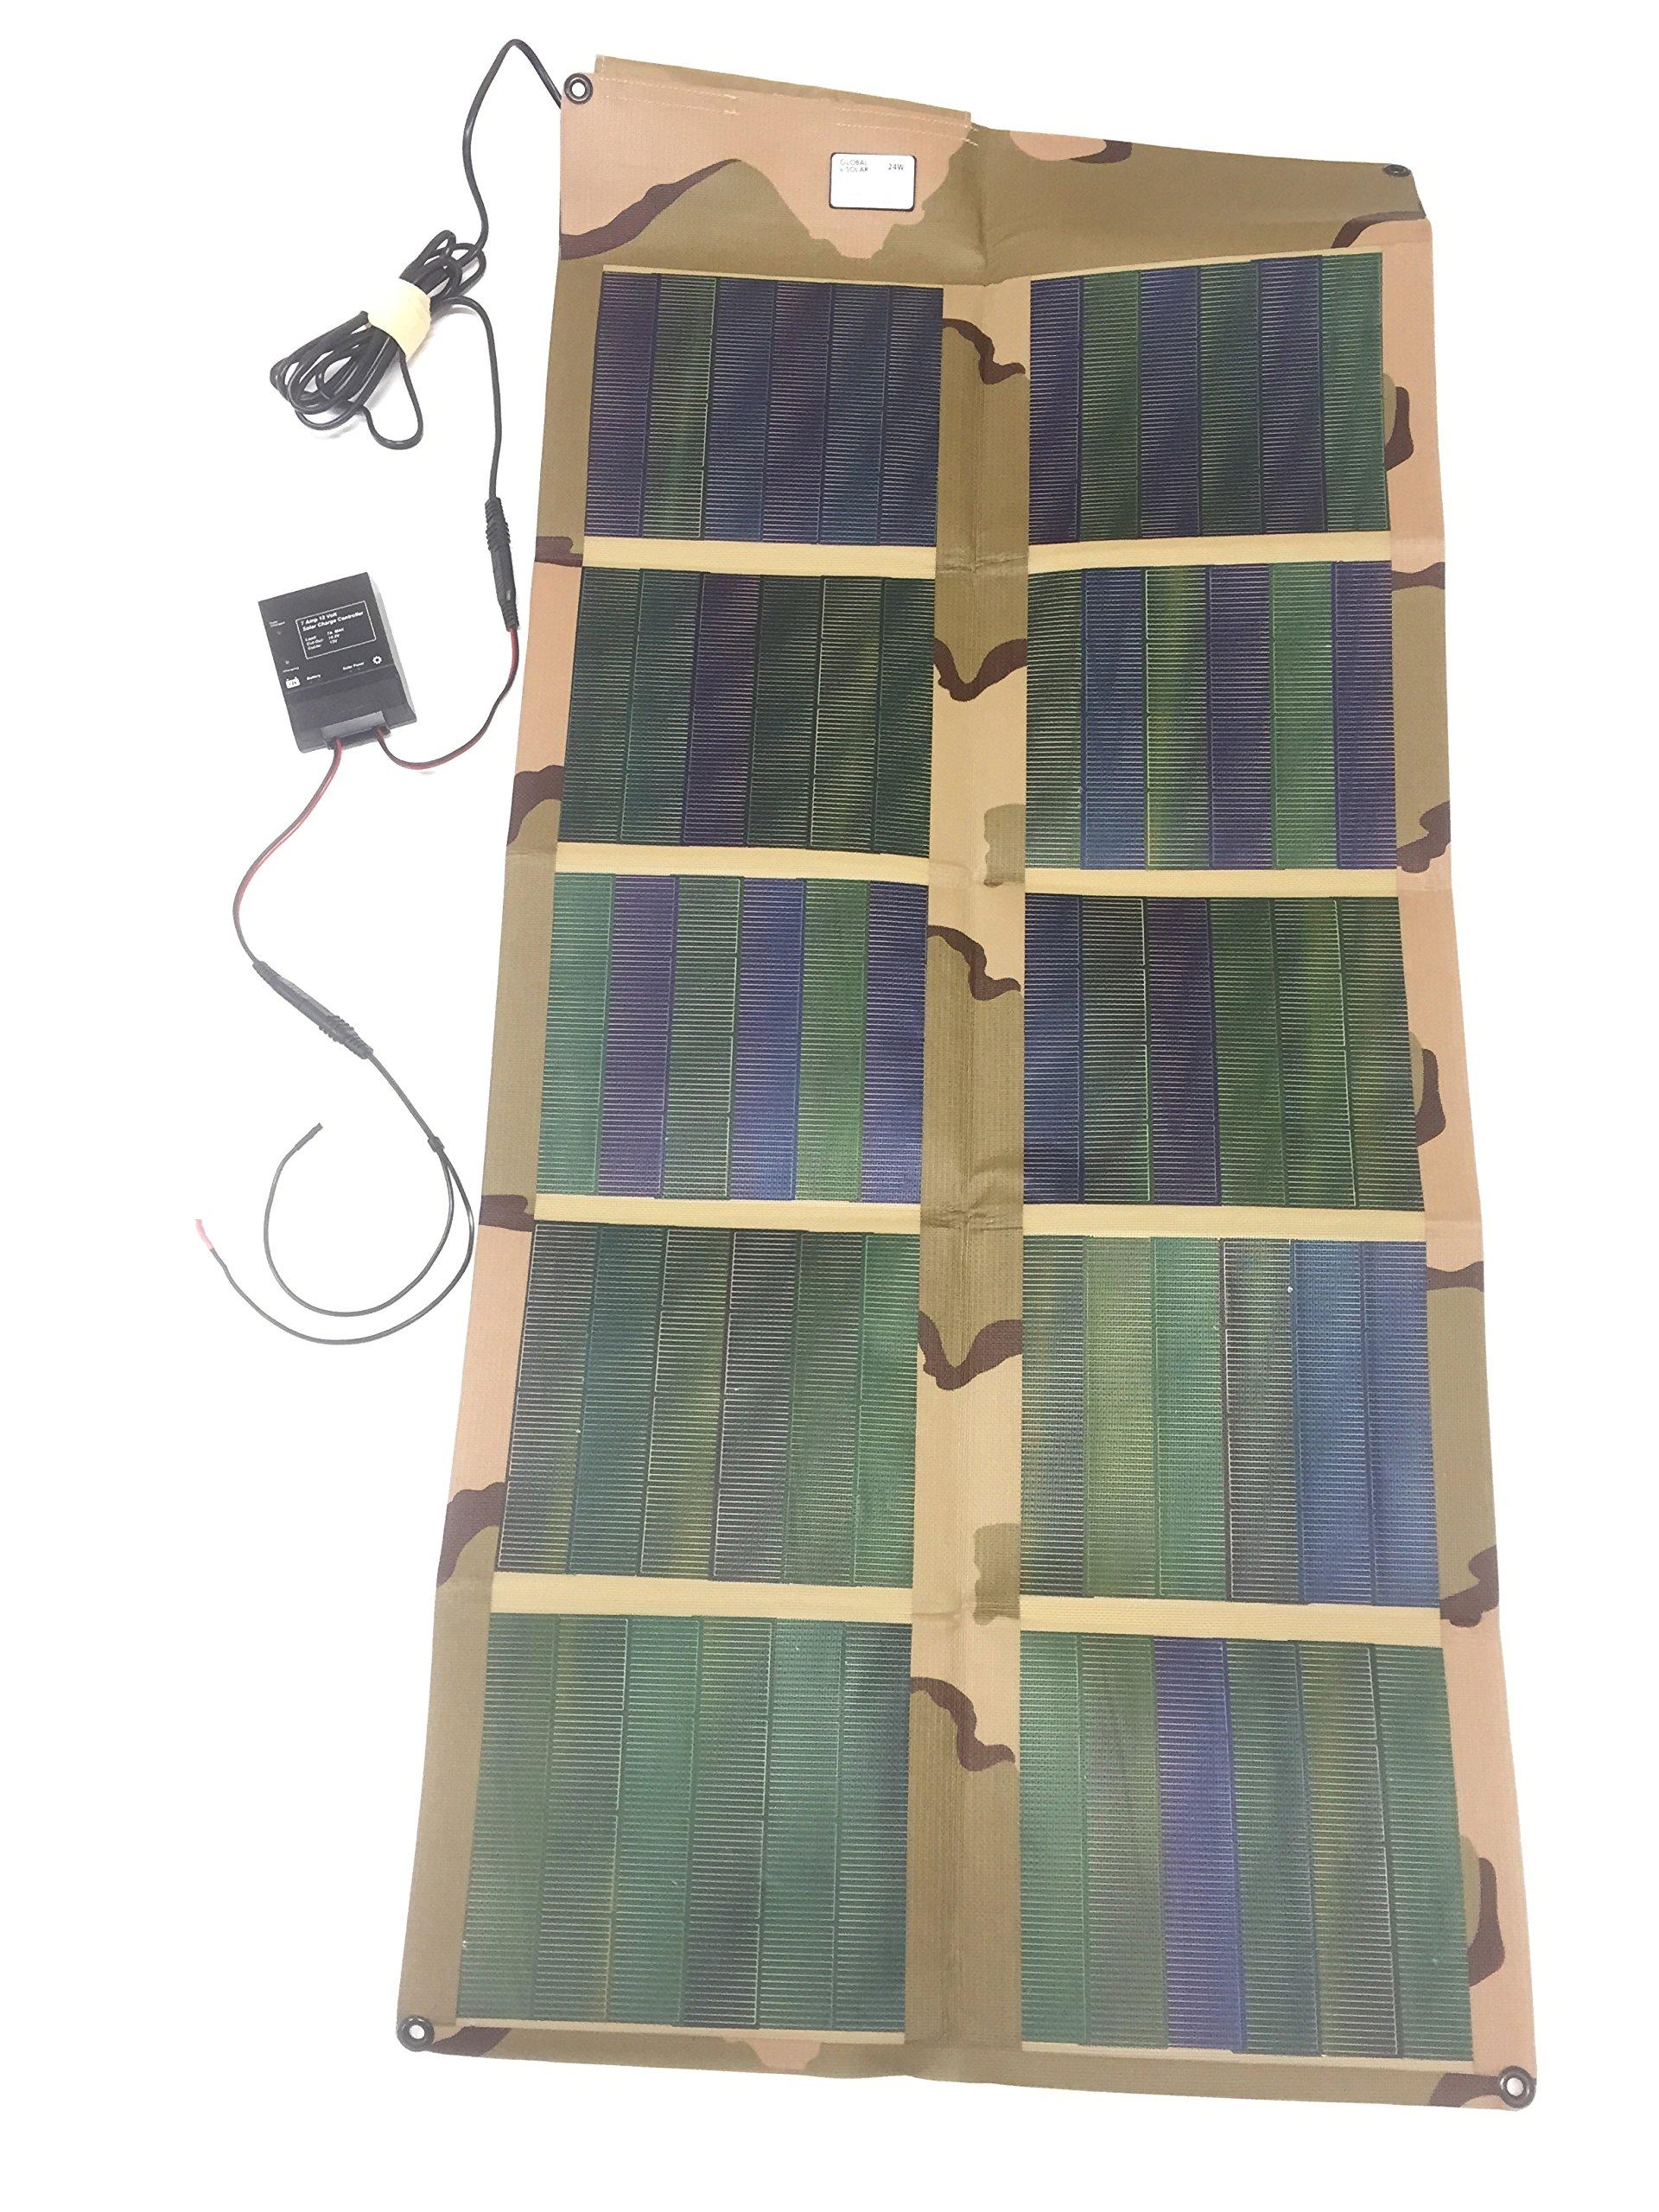 P3 International 22024S Solar Battery Charger, 24 Watt, 12V by P3 International